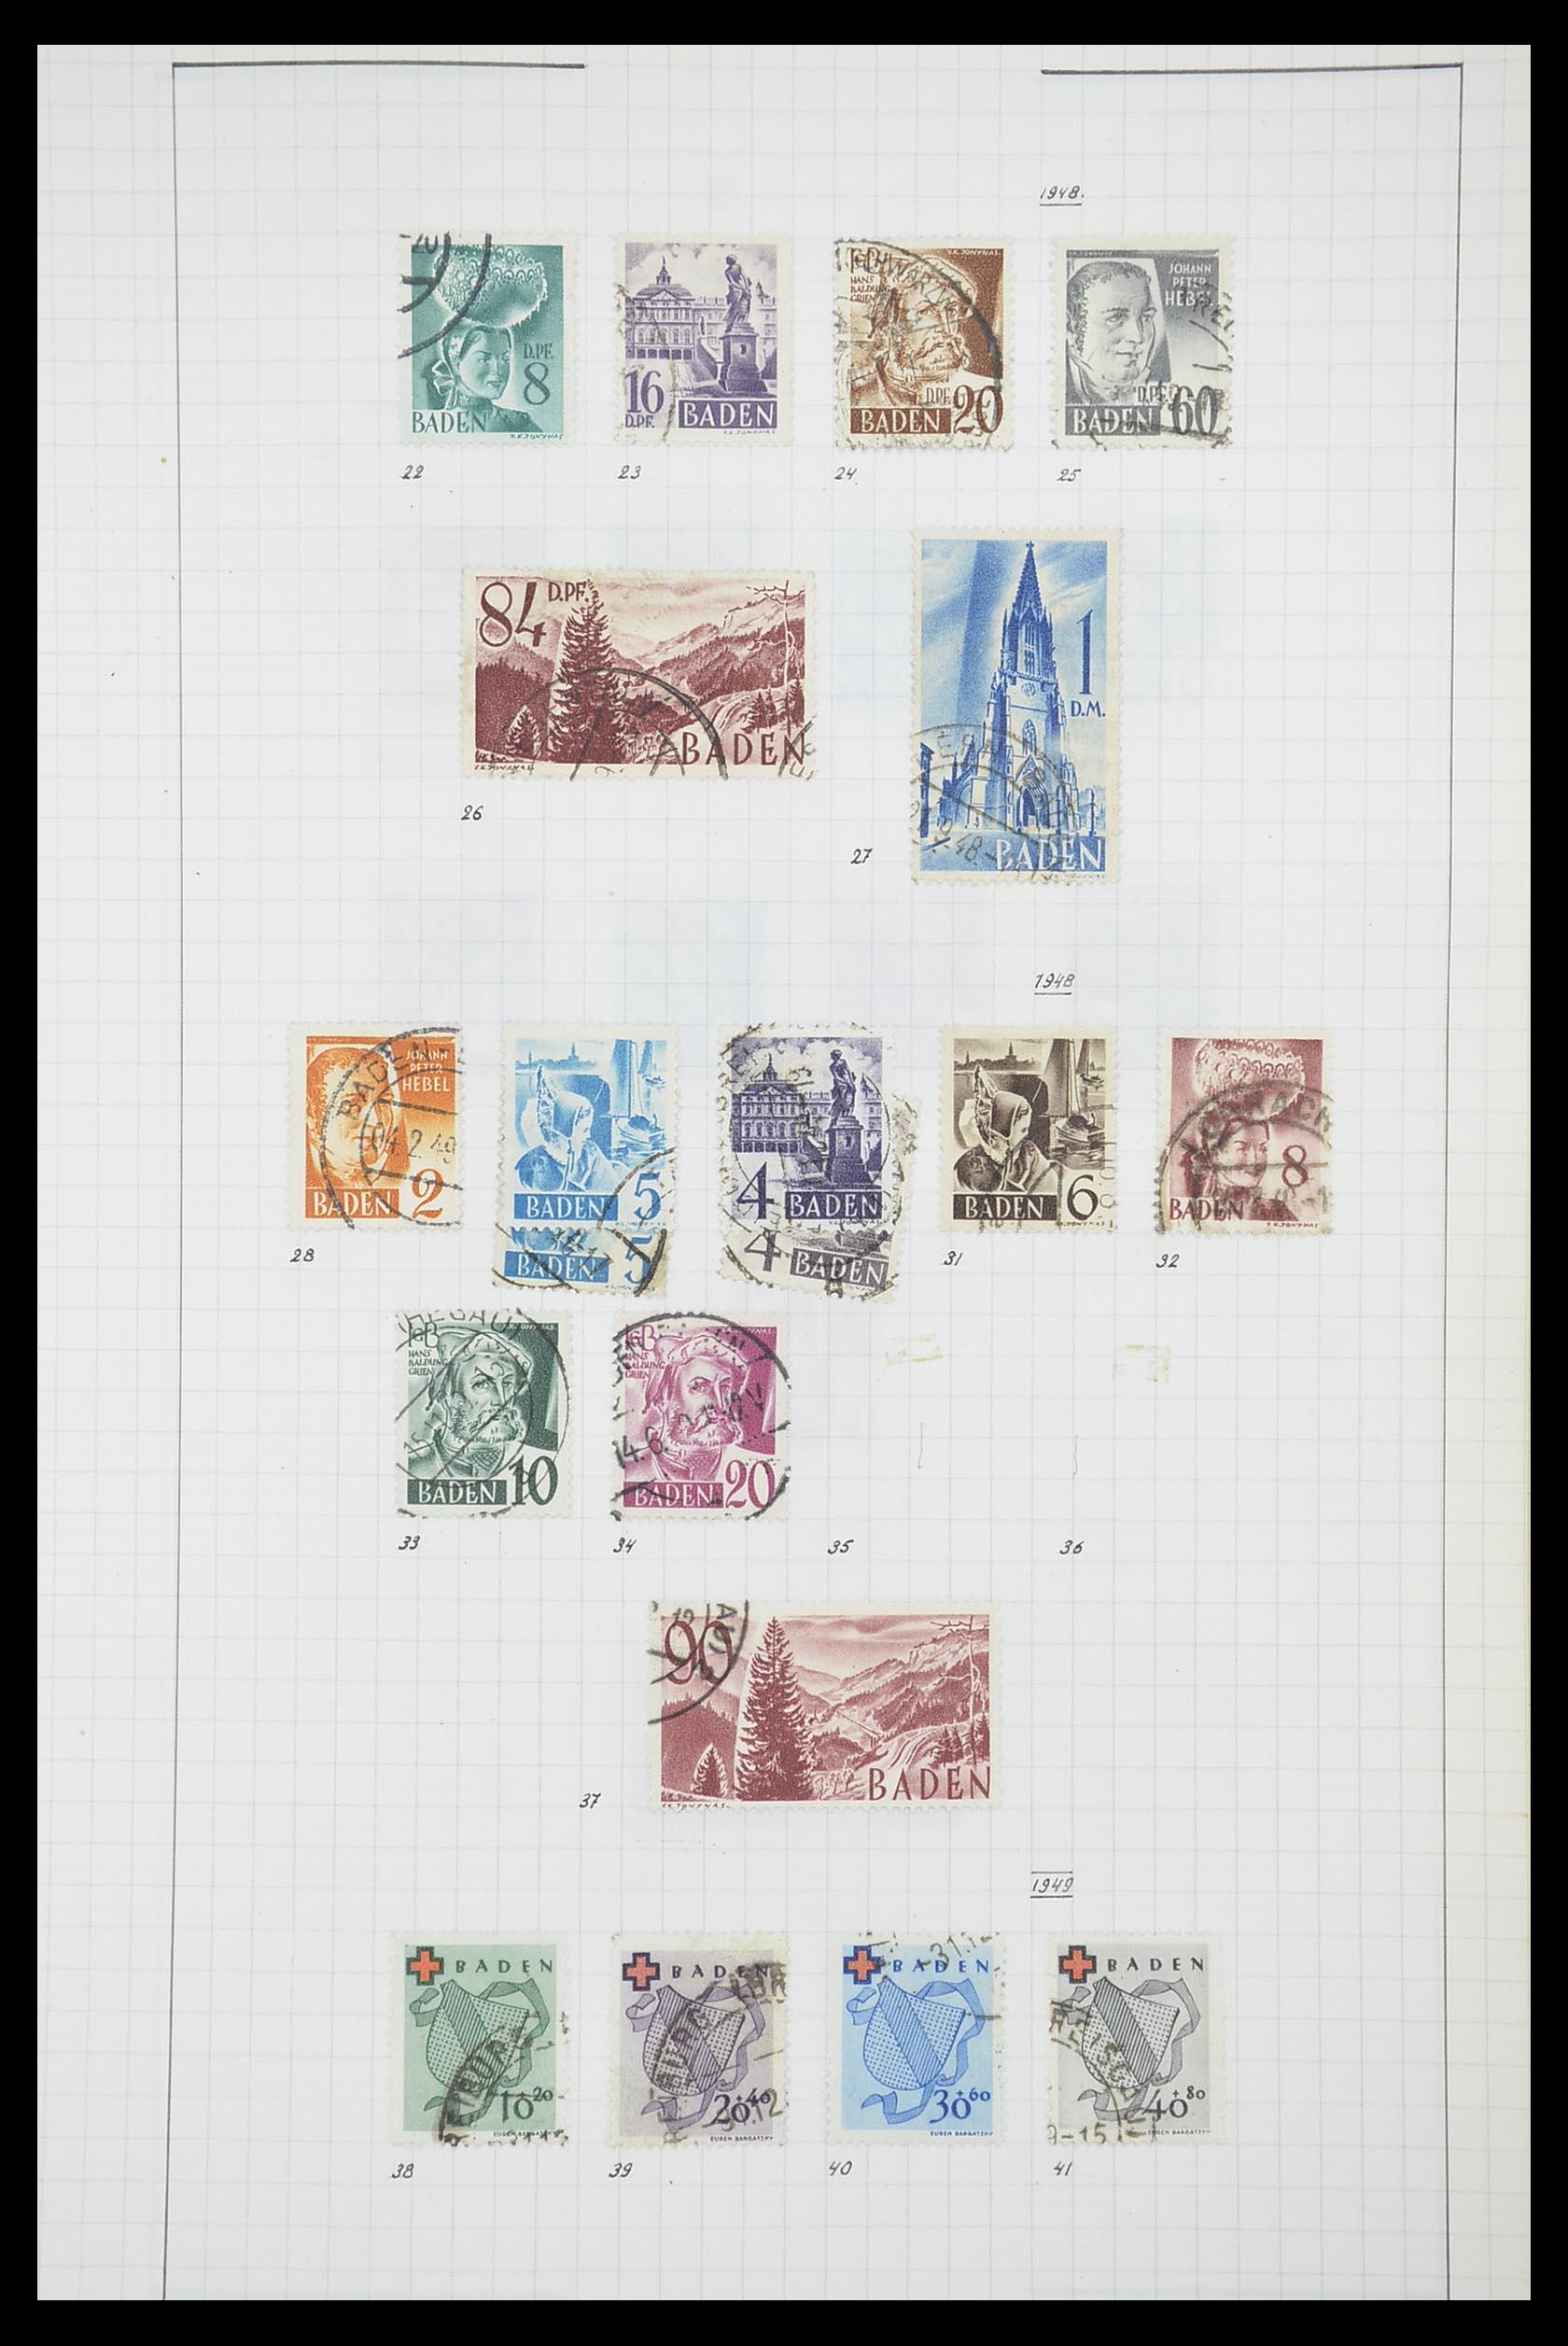 33864 008 - Postzegelverzameling 33864 Franse Zone 1945-1949.